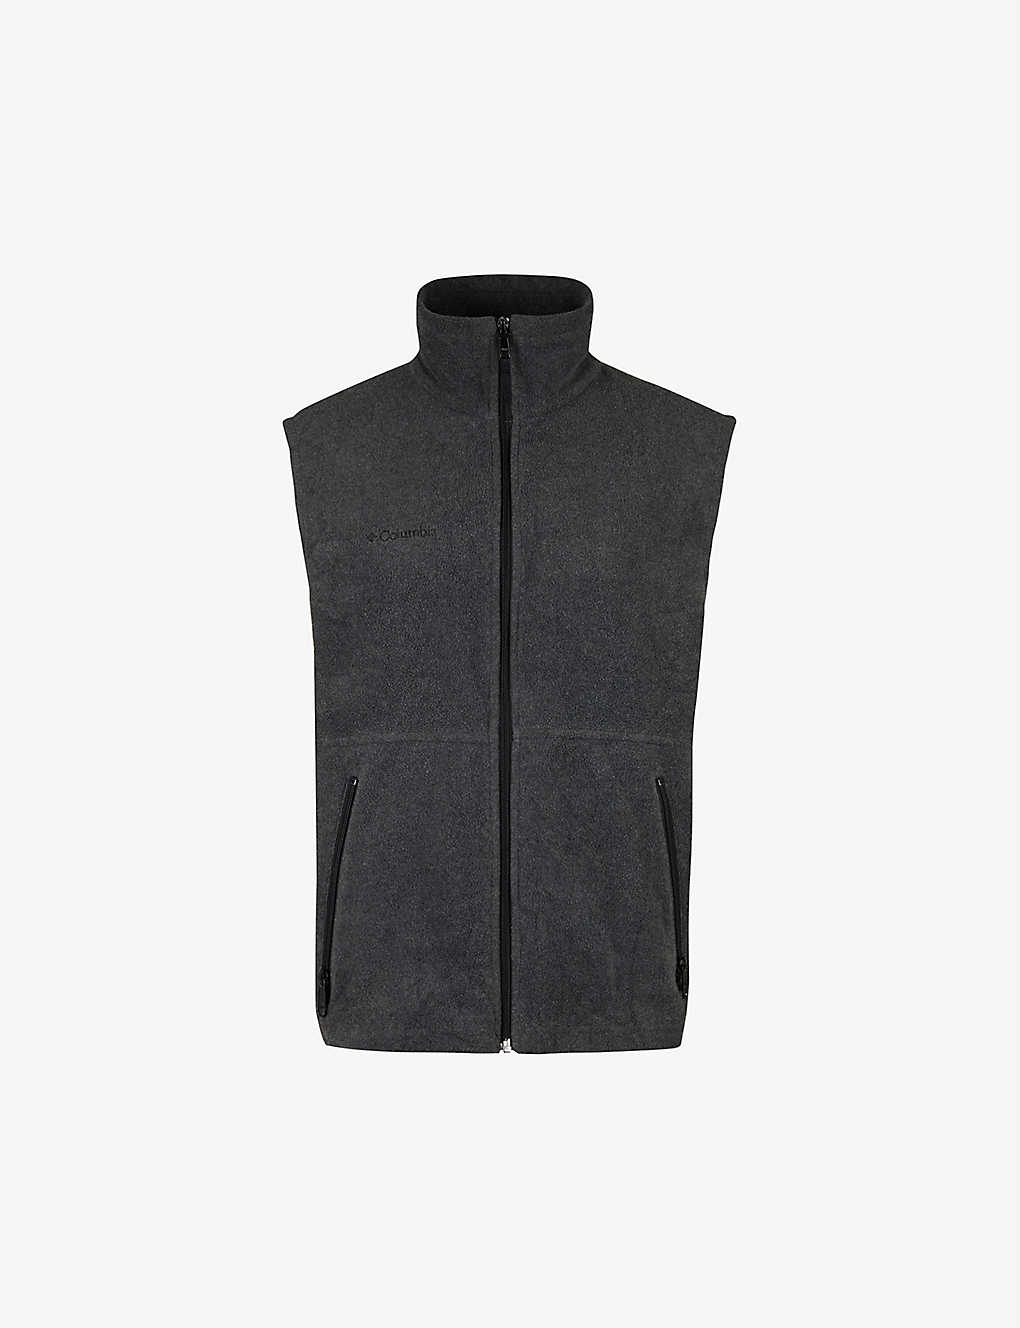 Pre-loved Columbia fleece gilet jacket